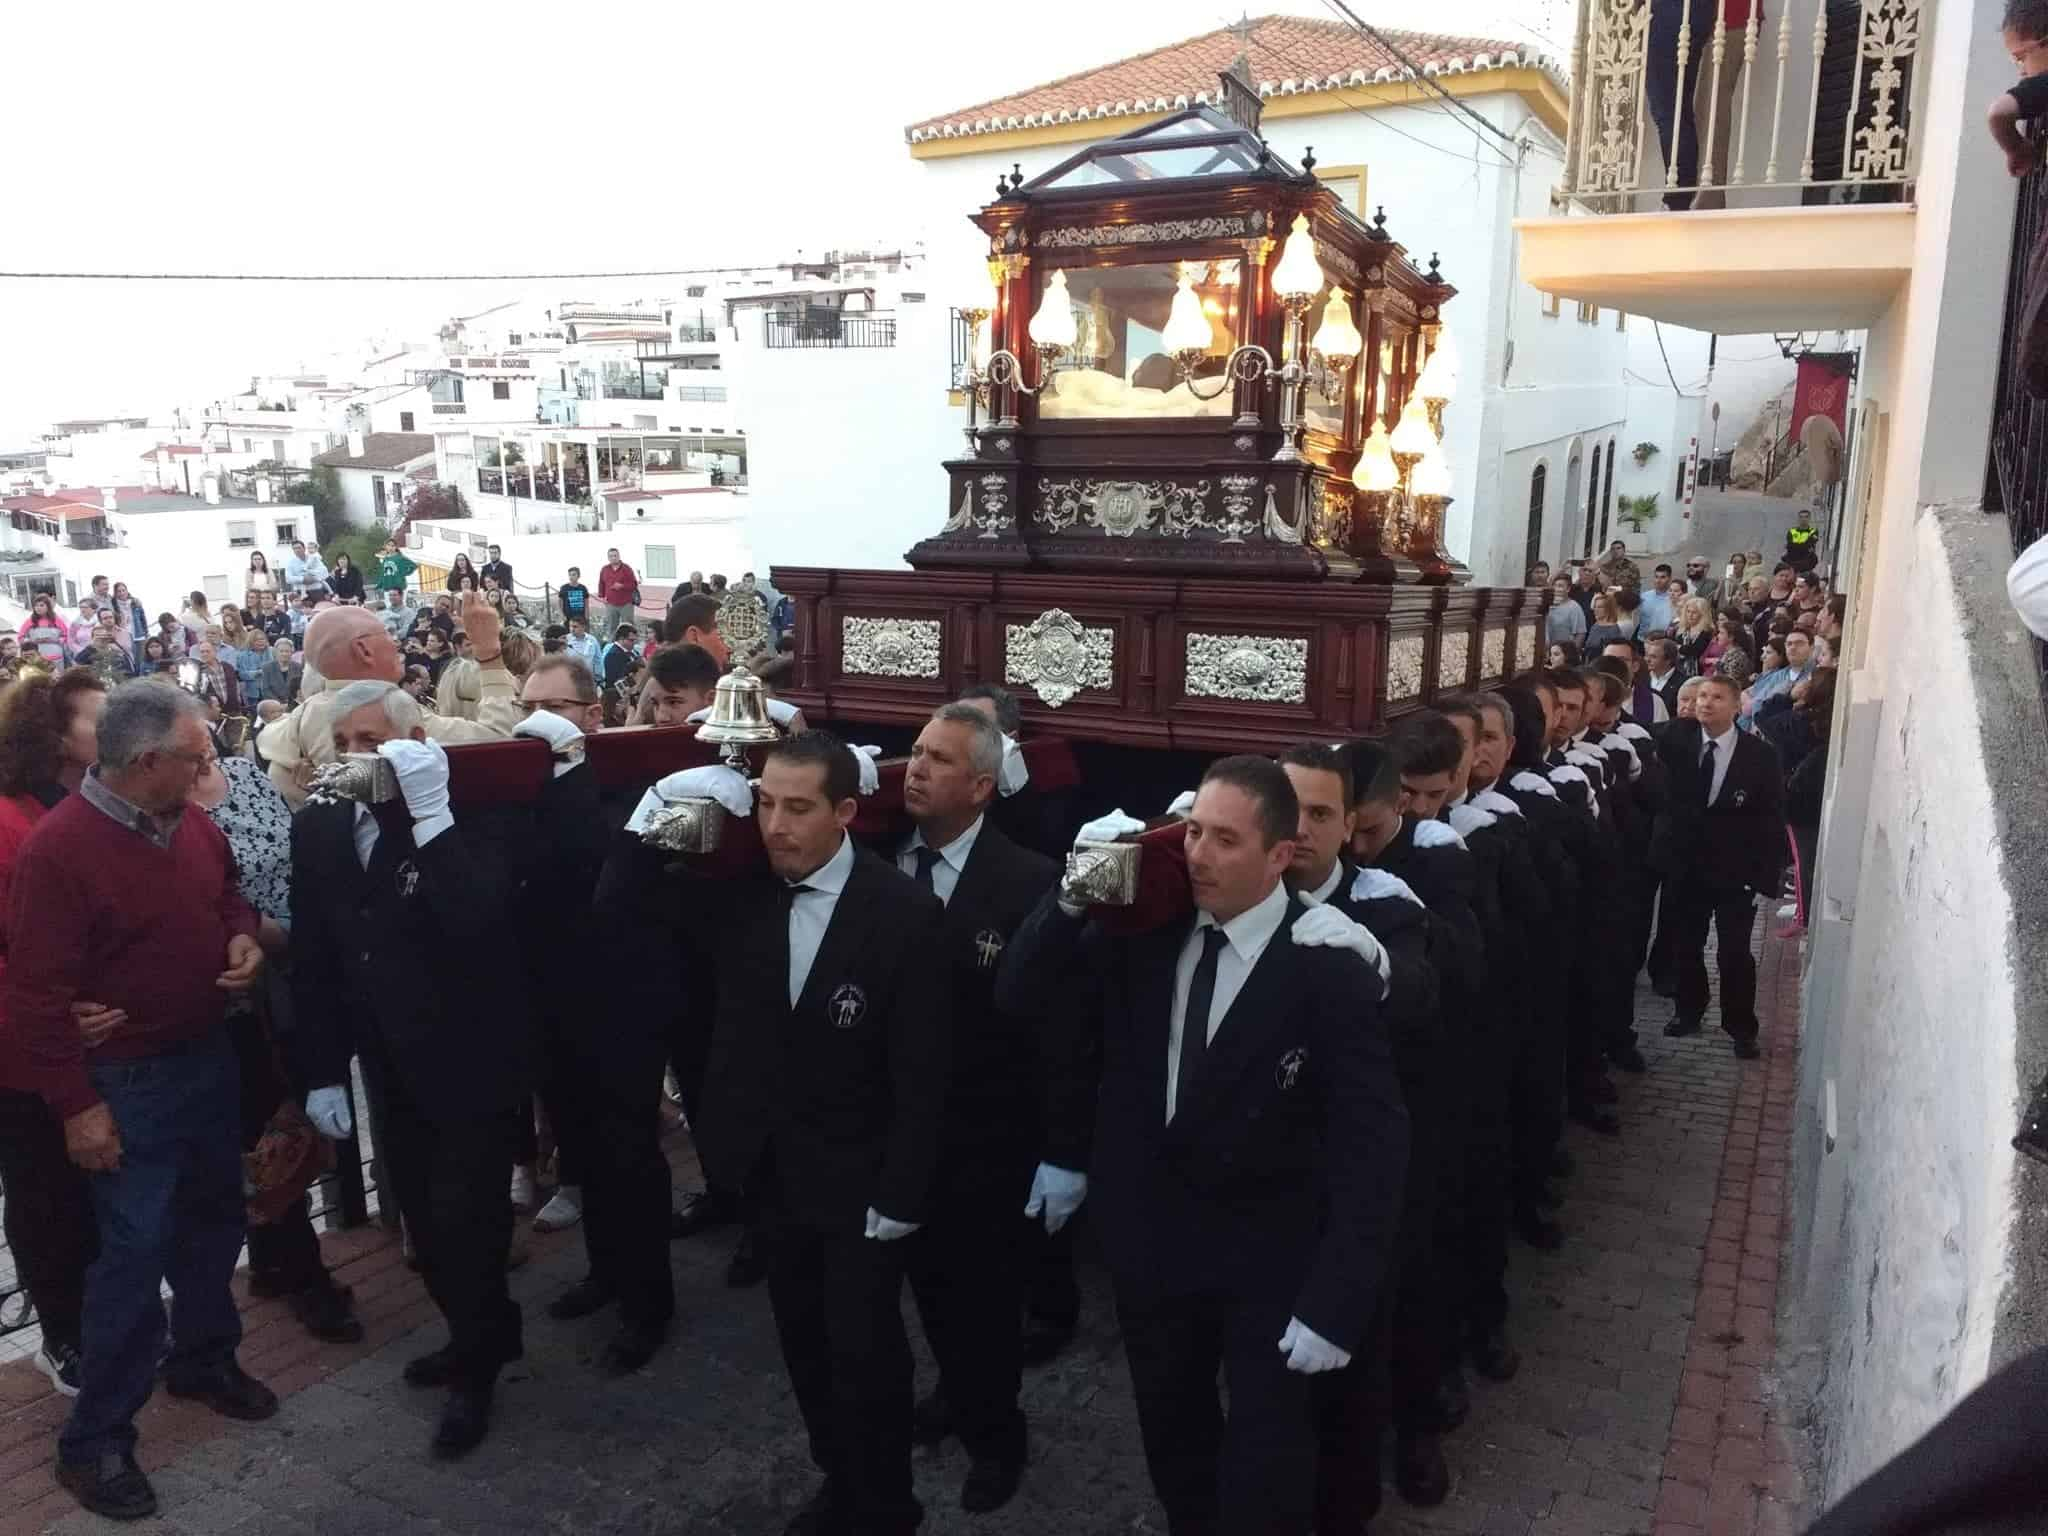 Holy Week in Spain | Celebrating Easter in Andalucia - Semana Santa